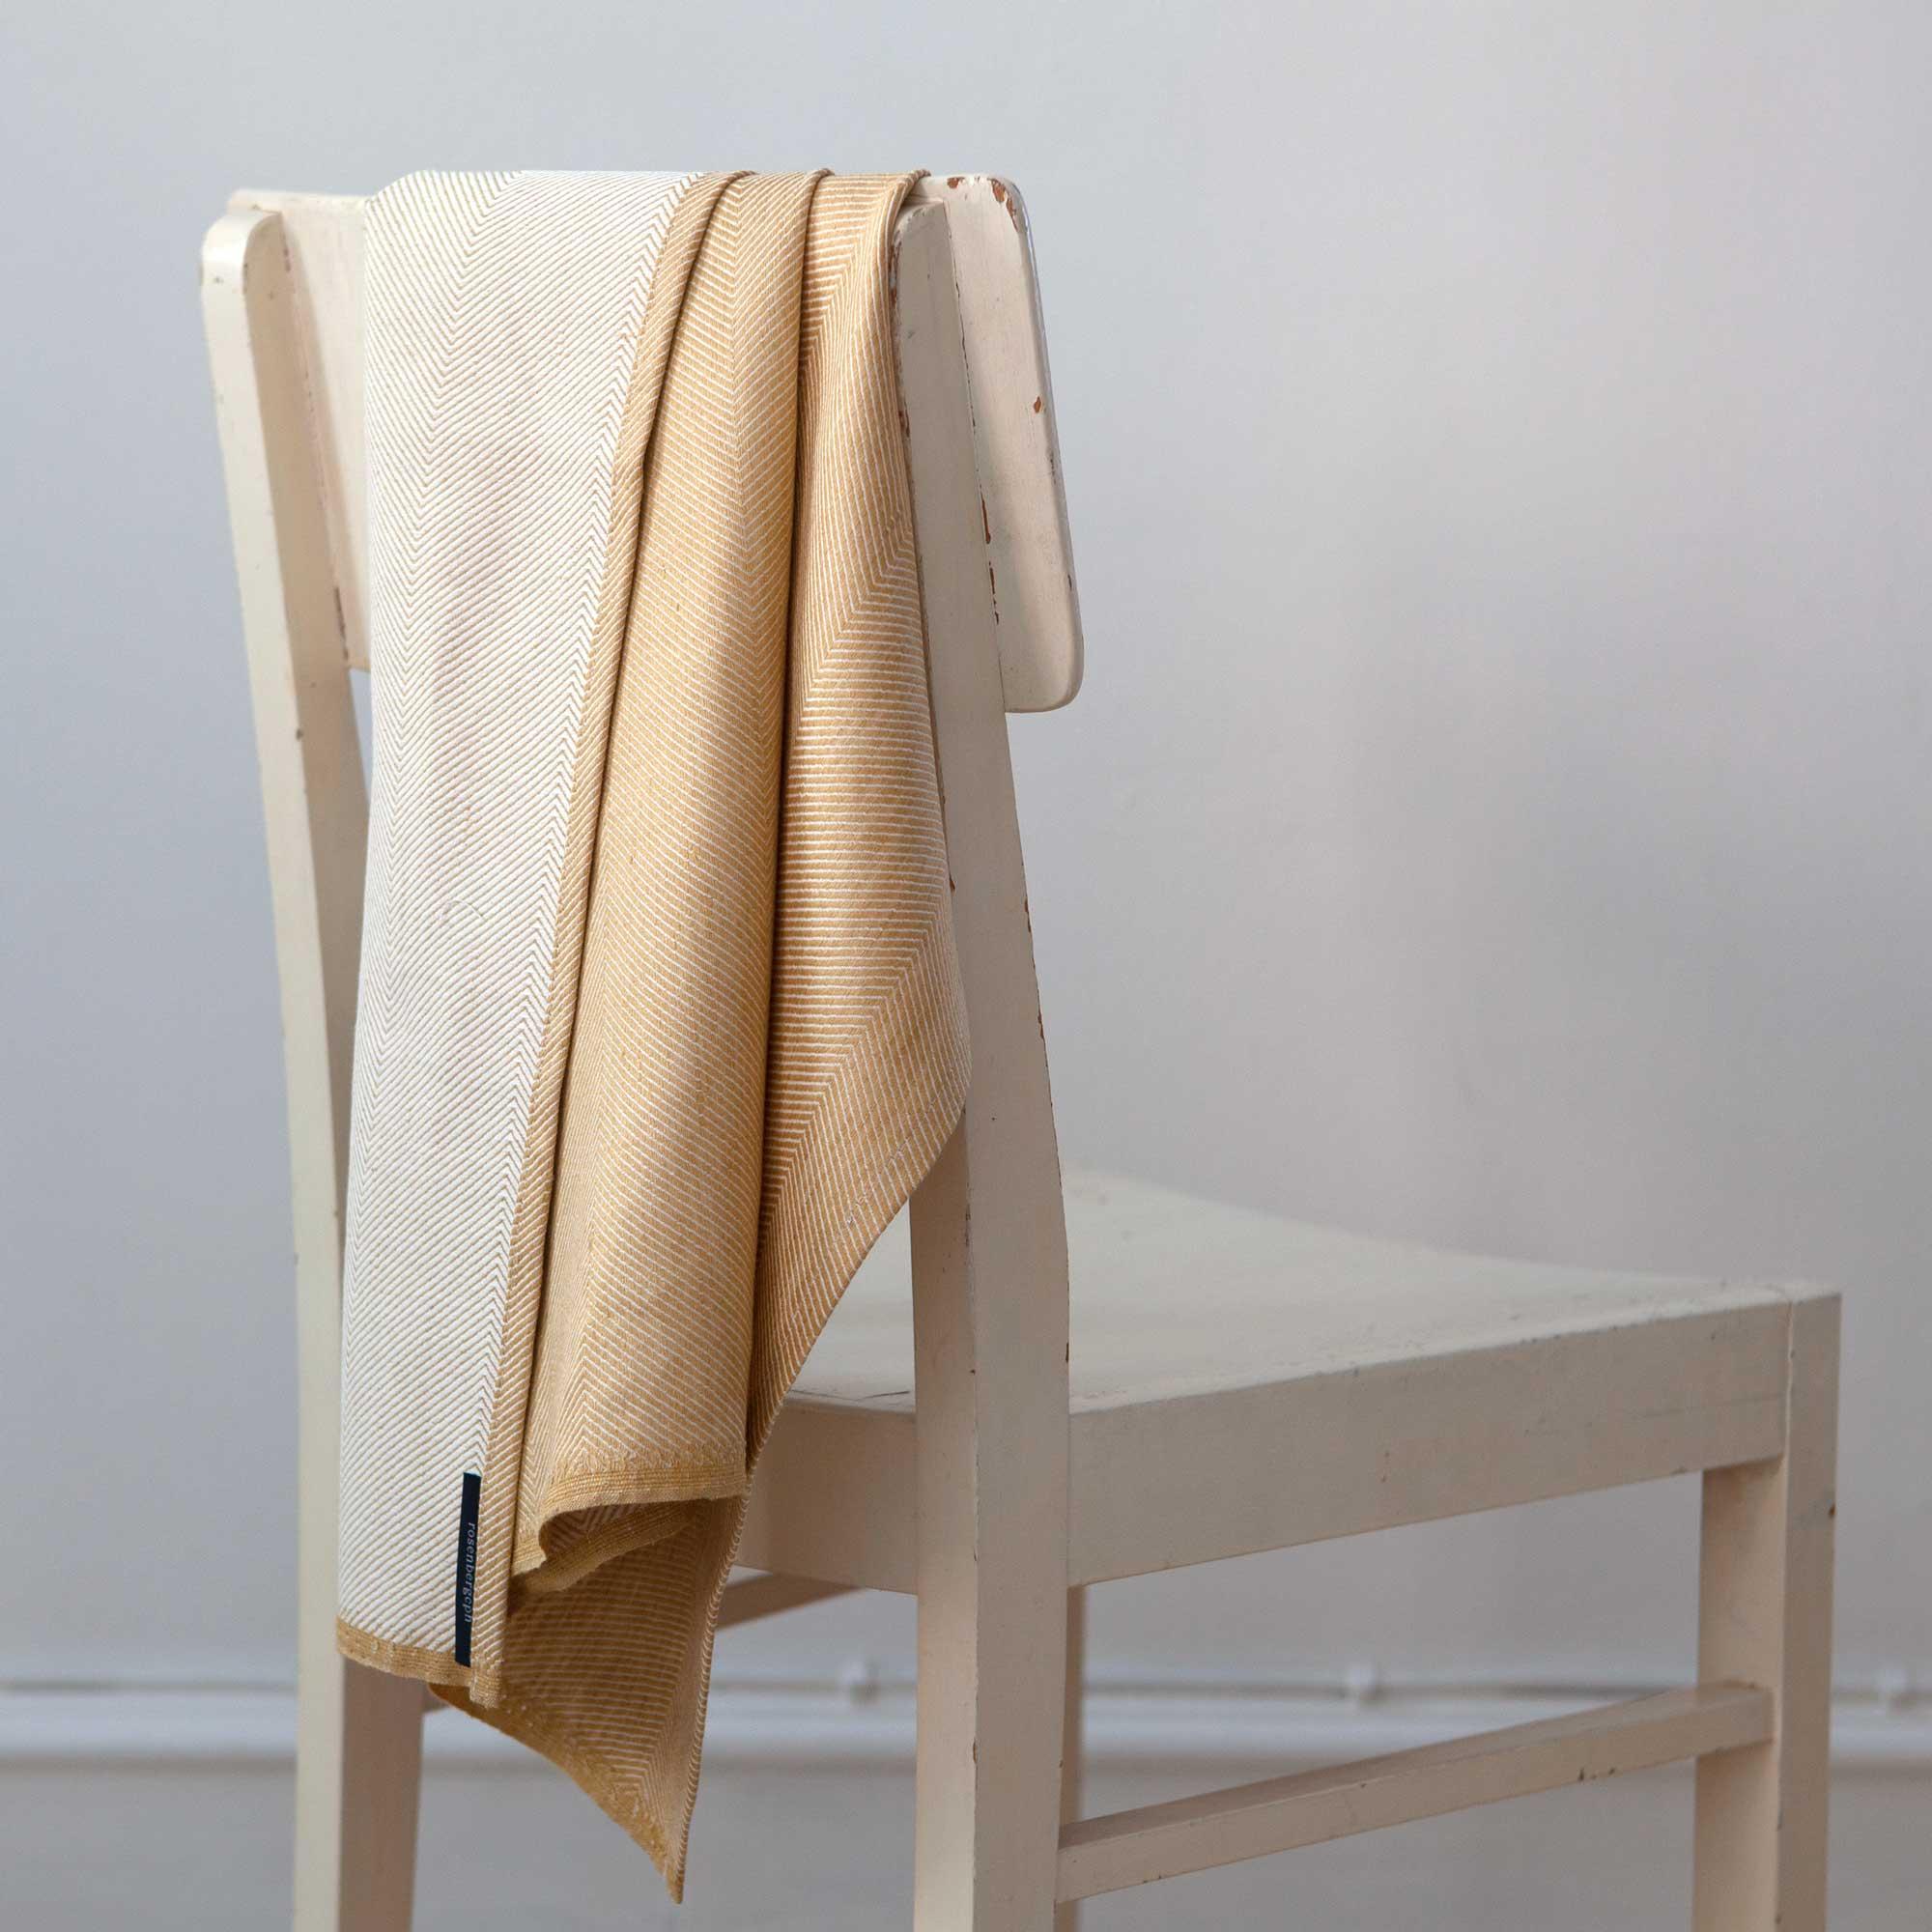 Towel, hay yellow, linen/cotton, design by Anne Rosenberg, RosenbergCph